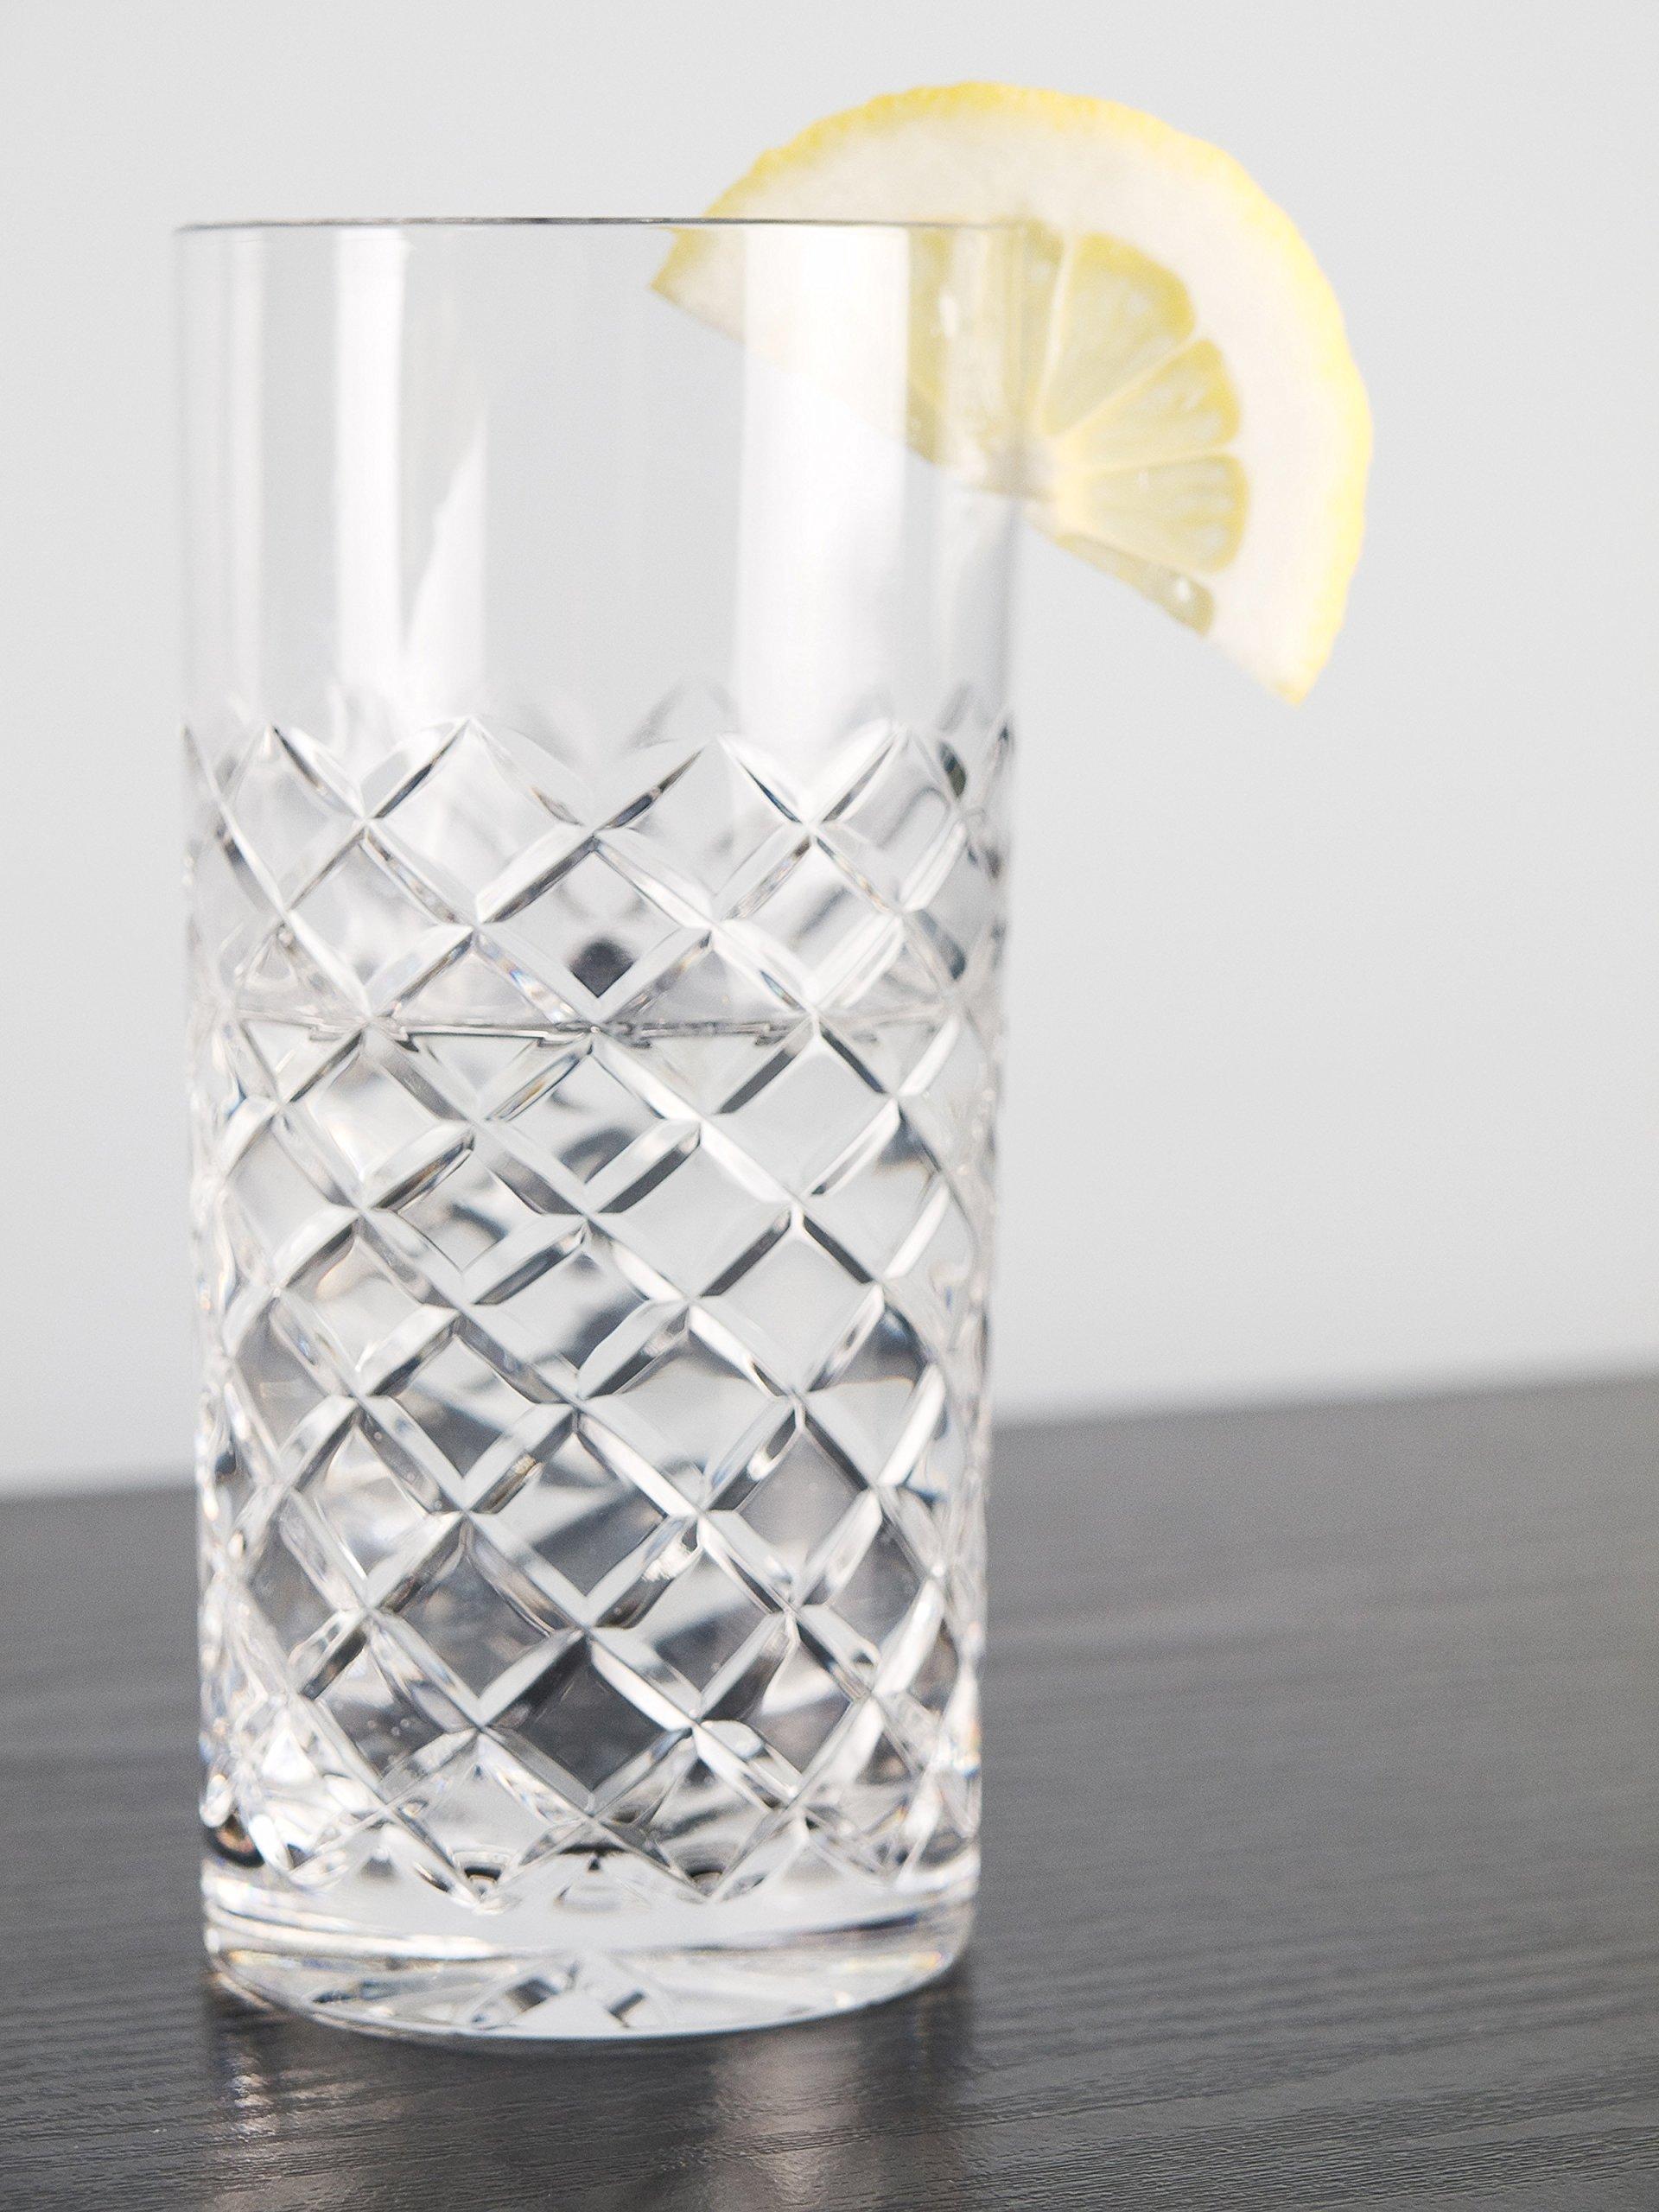 Barski - European Quality Crystal Glasses - Set Of 6 - Hand Cut Crystal - Highball Tumblers - Each Hiball Tumbler Glass is 14 oz. - Made in Europe by Barski